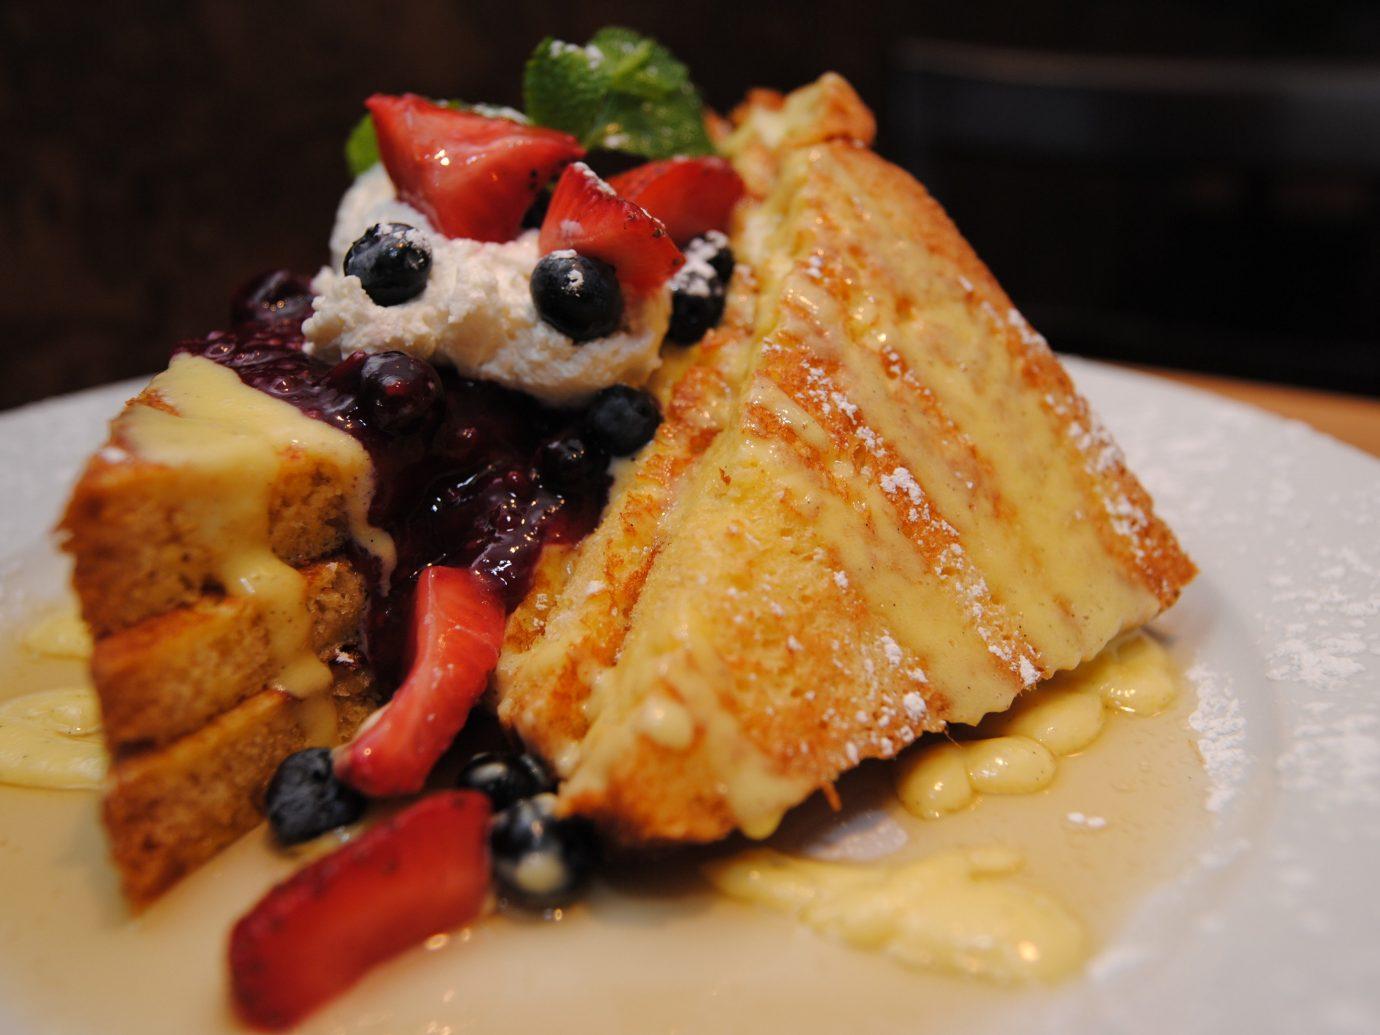 Food + Drink food dish plate meal piece breakfast slice produce brunch cuisine dessert flavor square piece de resistance